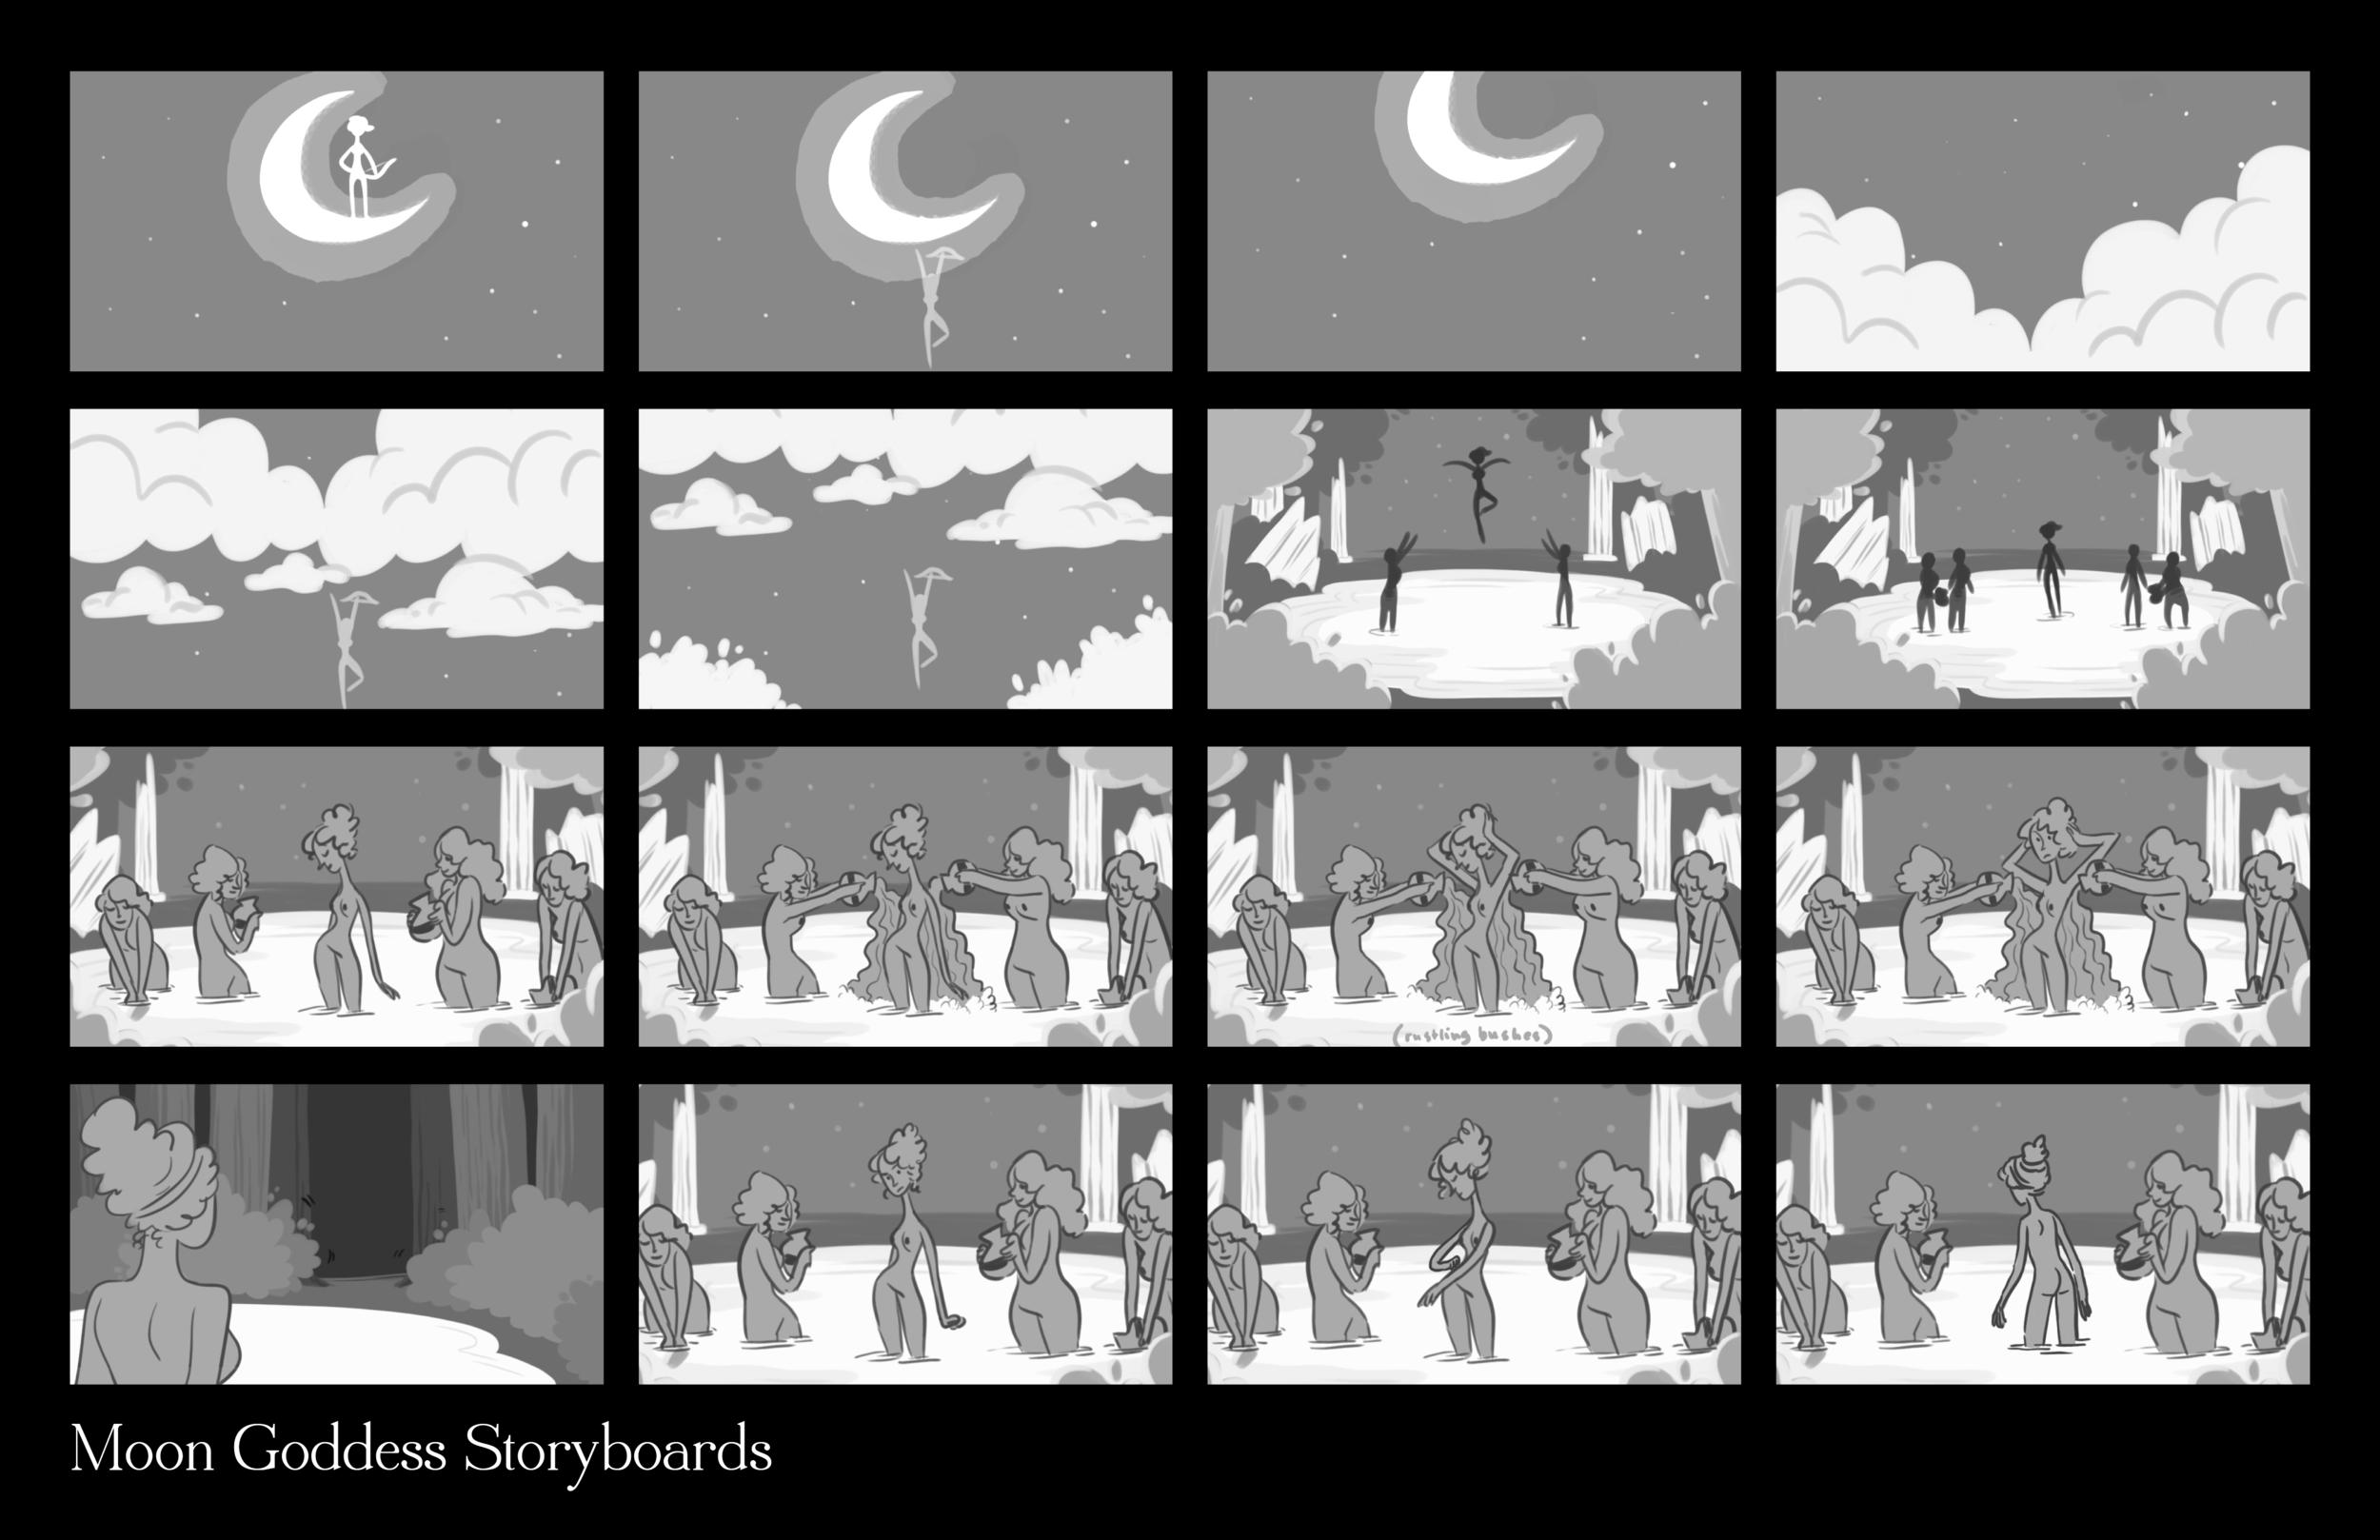 06-moongoddess-story-1.png